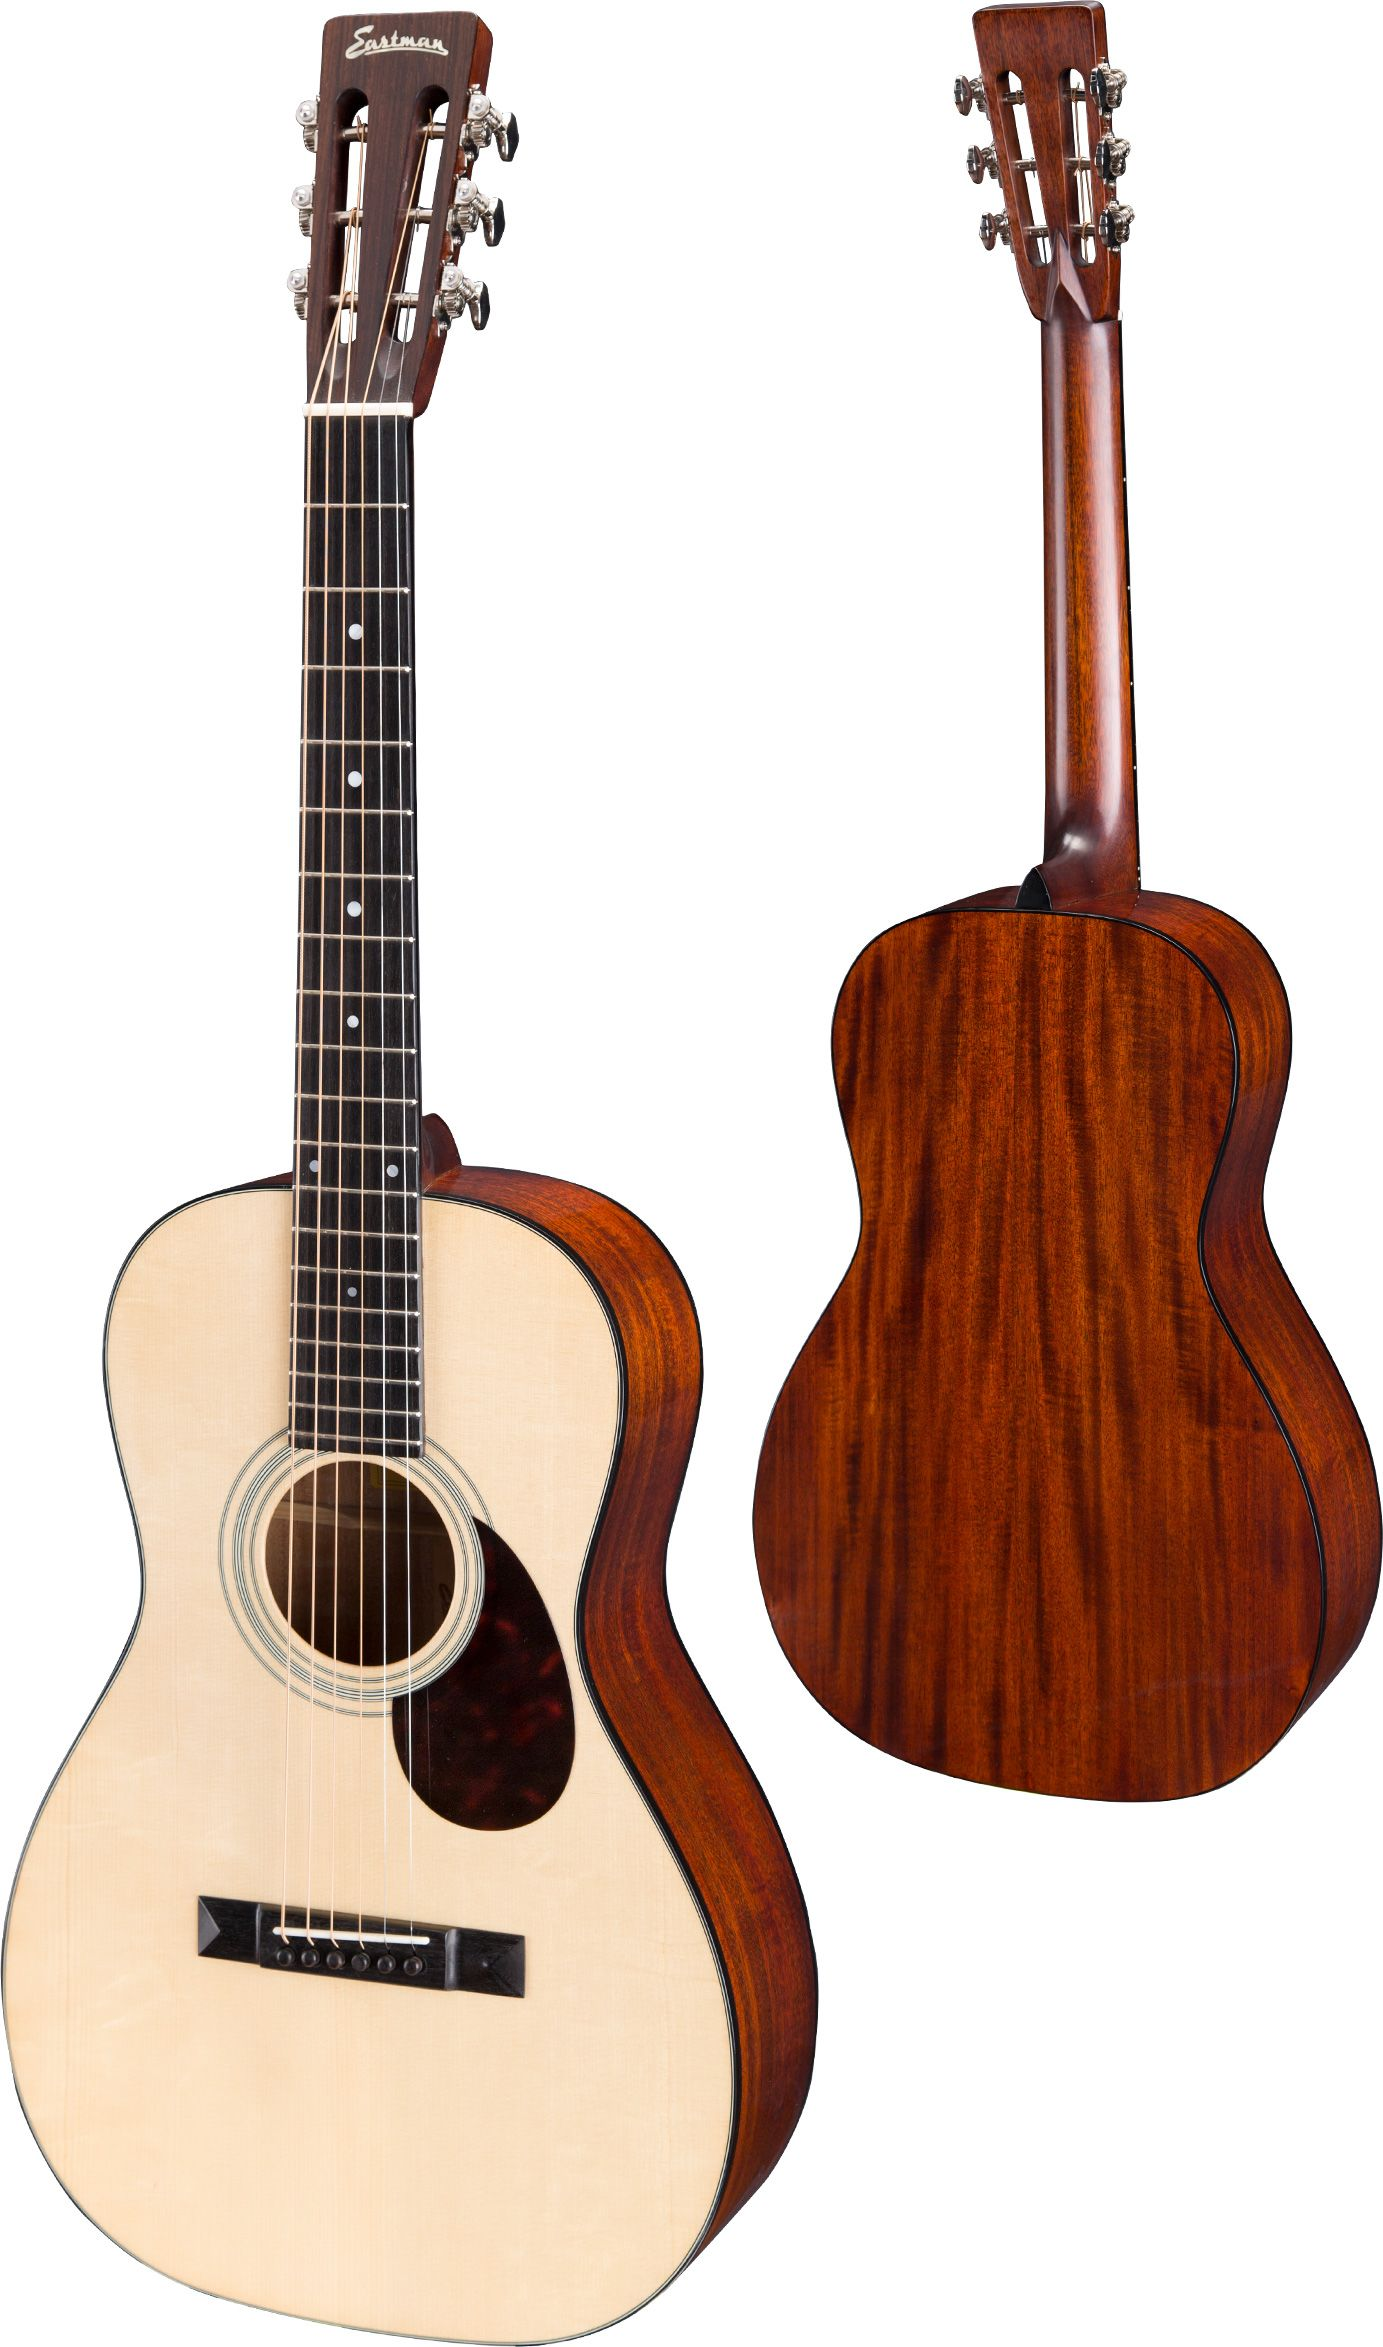 E10p Acoustic Guitar Learn Guitar Guitar